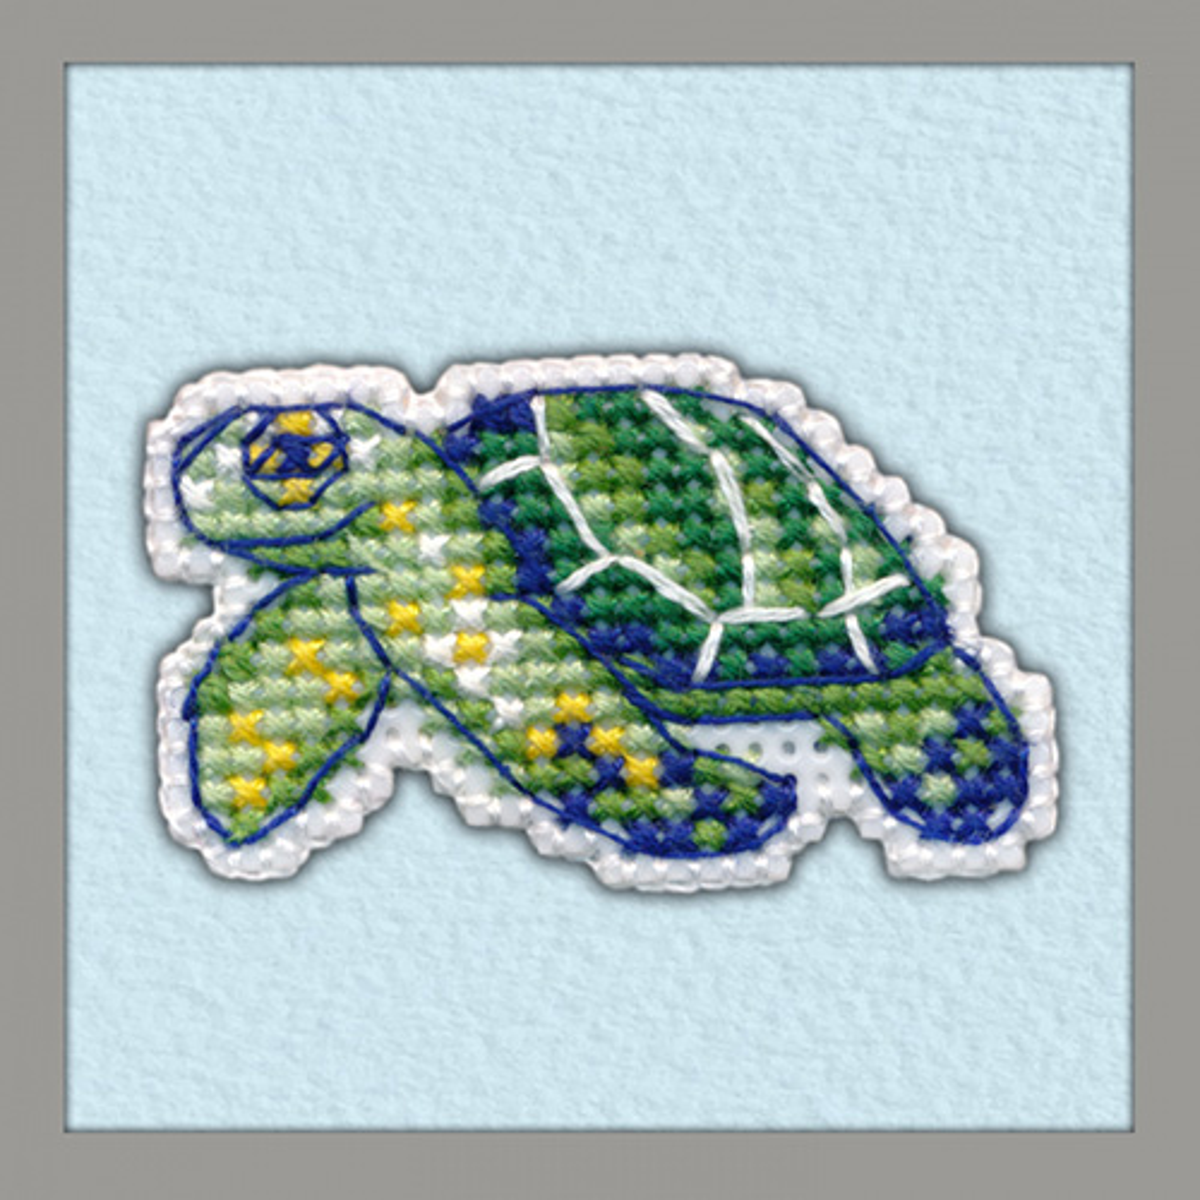 1097 Значок на пластиковой канве ОВЕН 'Черепаха' 4,9х2,9 см